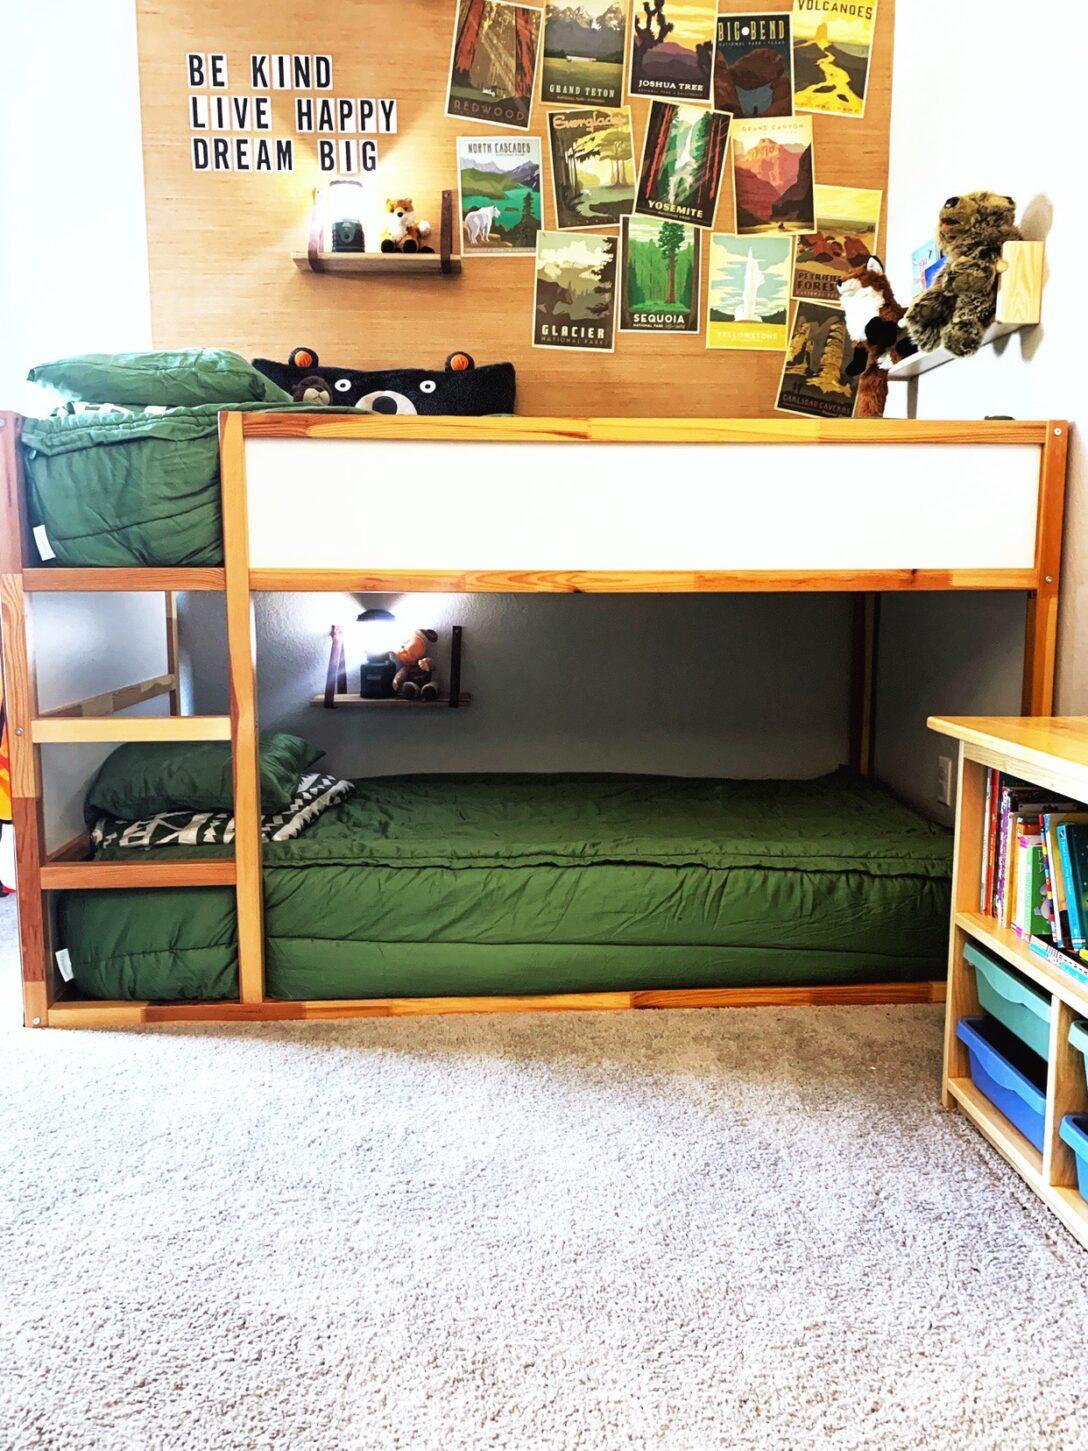 Large Size of Ikea Kura Hack House Bed Montessori Storage Floor Hacks Pinterest Slide Ideas Bunk With Pegboard Jill Krause Wohnzimmer Kura Hack